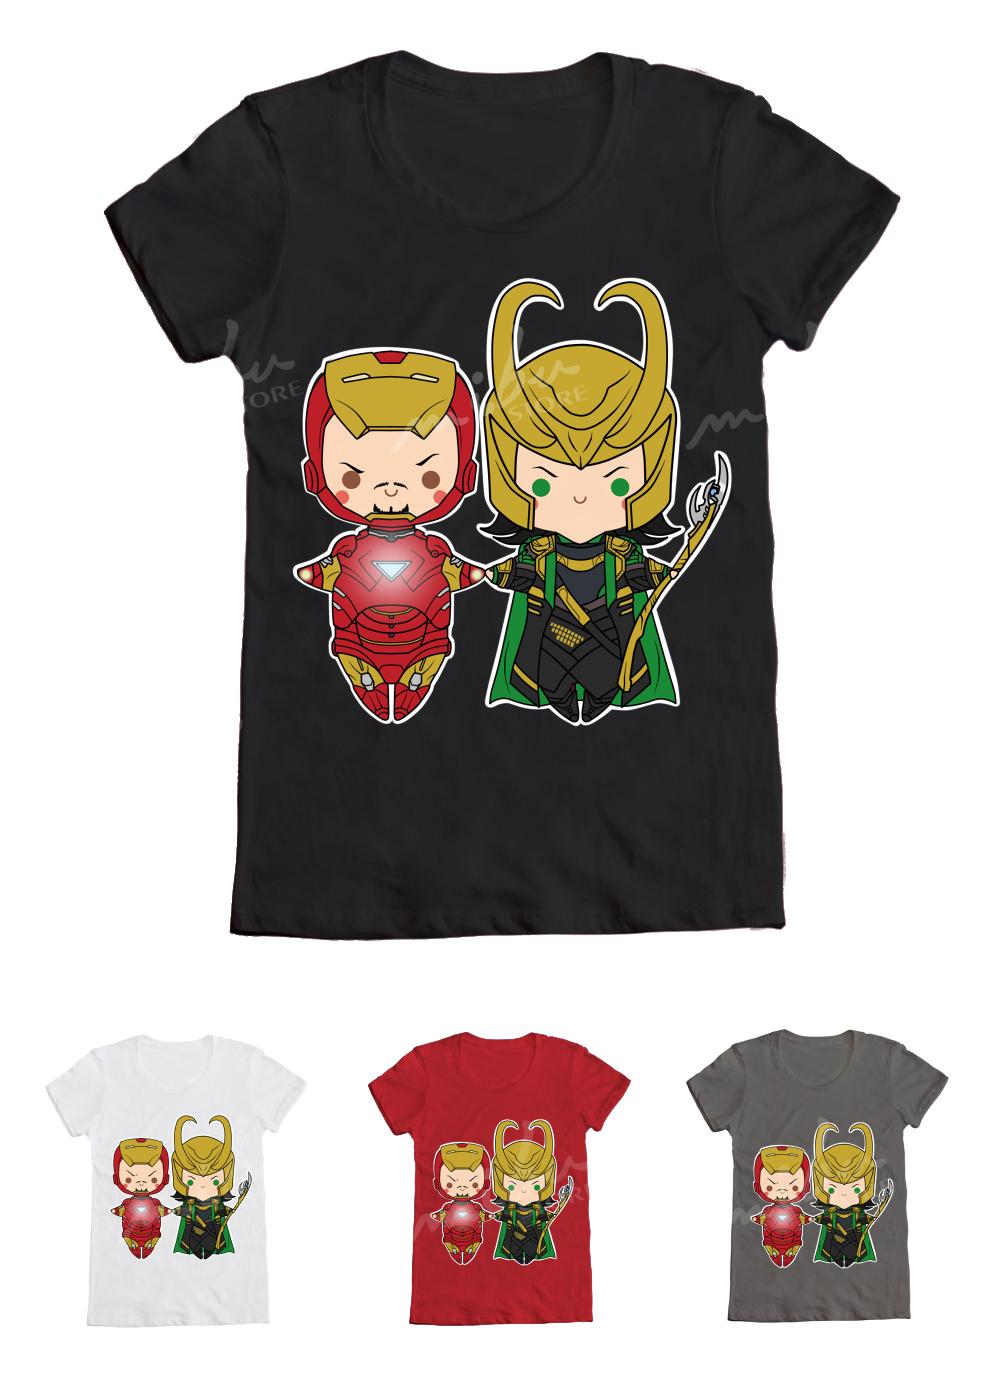 Black sabbath t shirt avengers - The Avengers Ironman Loki Ironfrost T Shirt